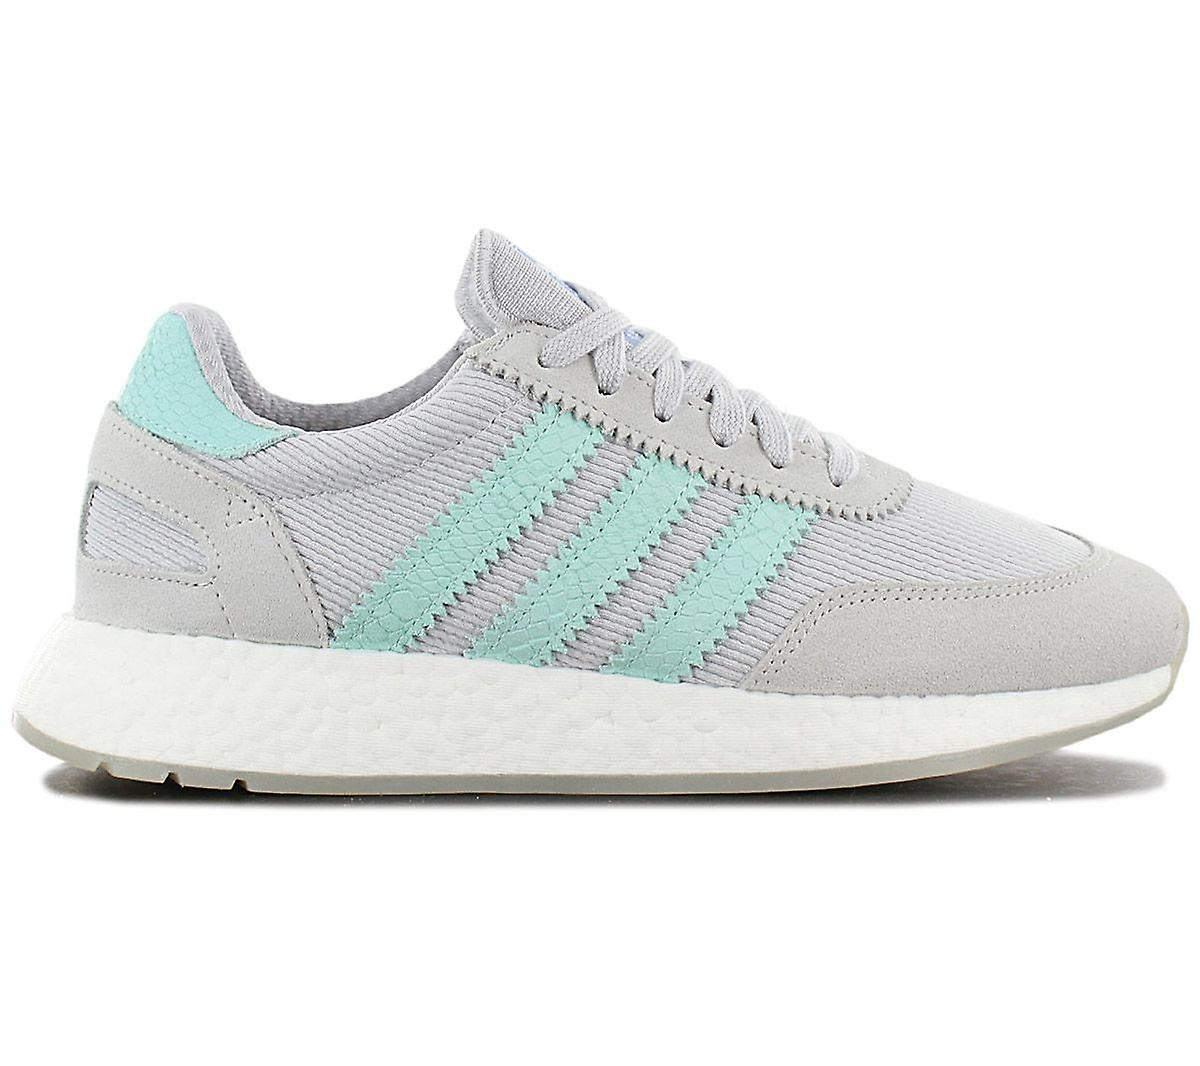 Adidas Originals Iniki I-5923 W Boost - Damen Schuhe Grau-türkis D97349 Sneakers Sportschuhe